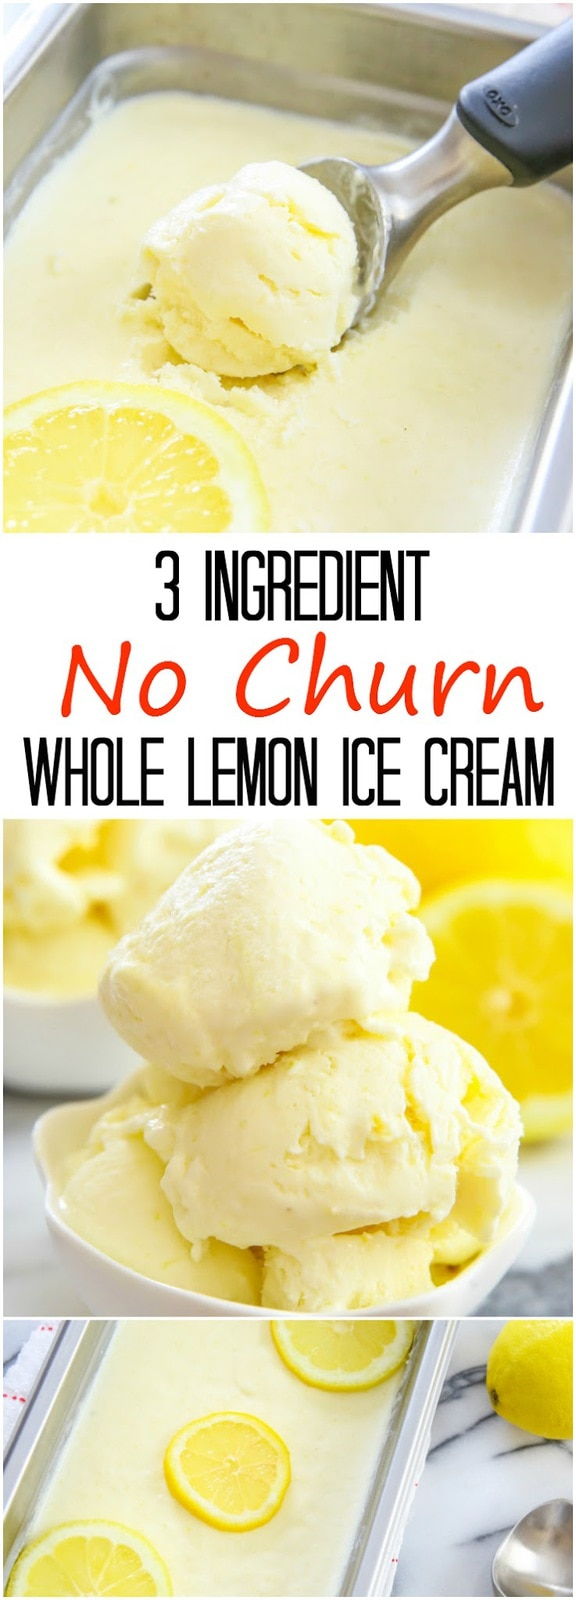 3 Ingredient No Churn Creamy Whole Lemon Ice Cream. No ice cream maker needed!